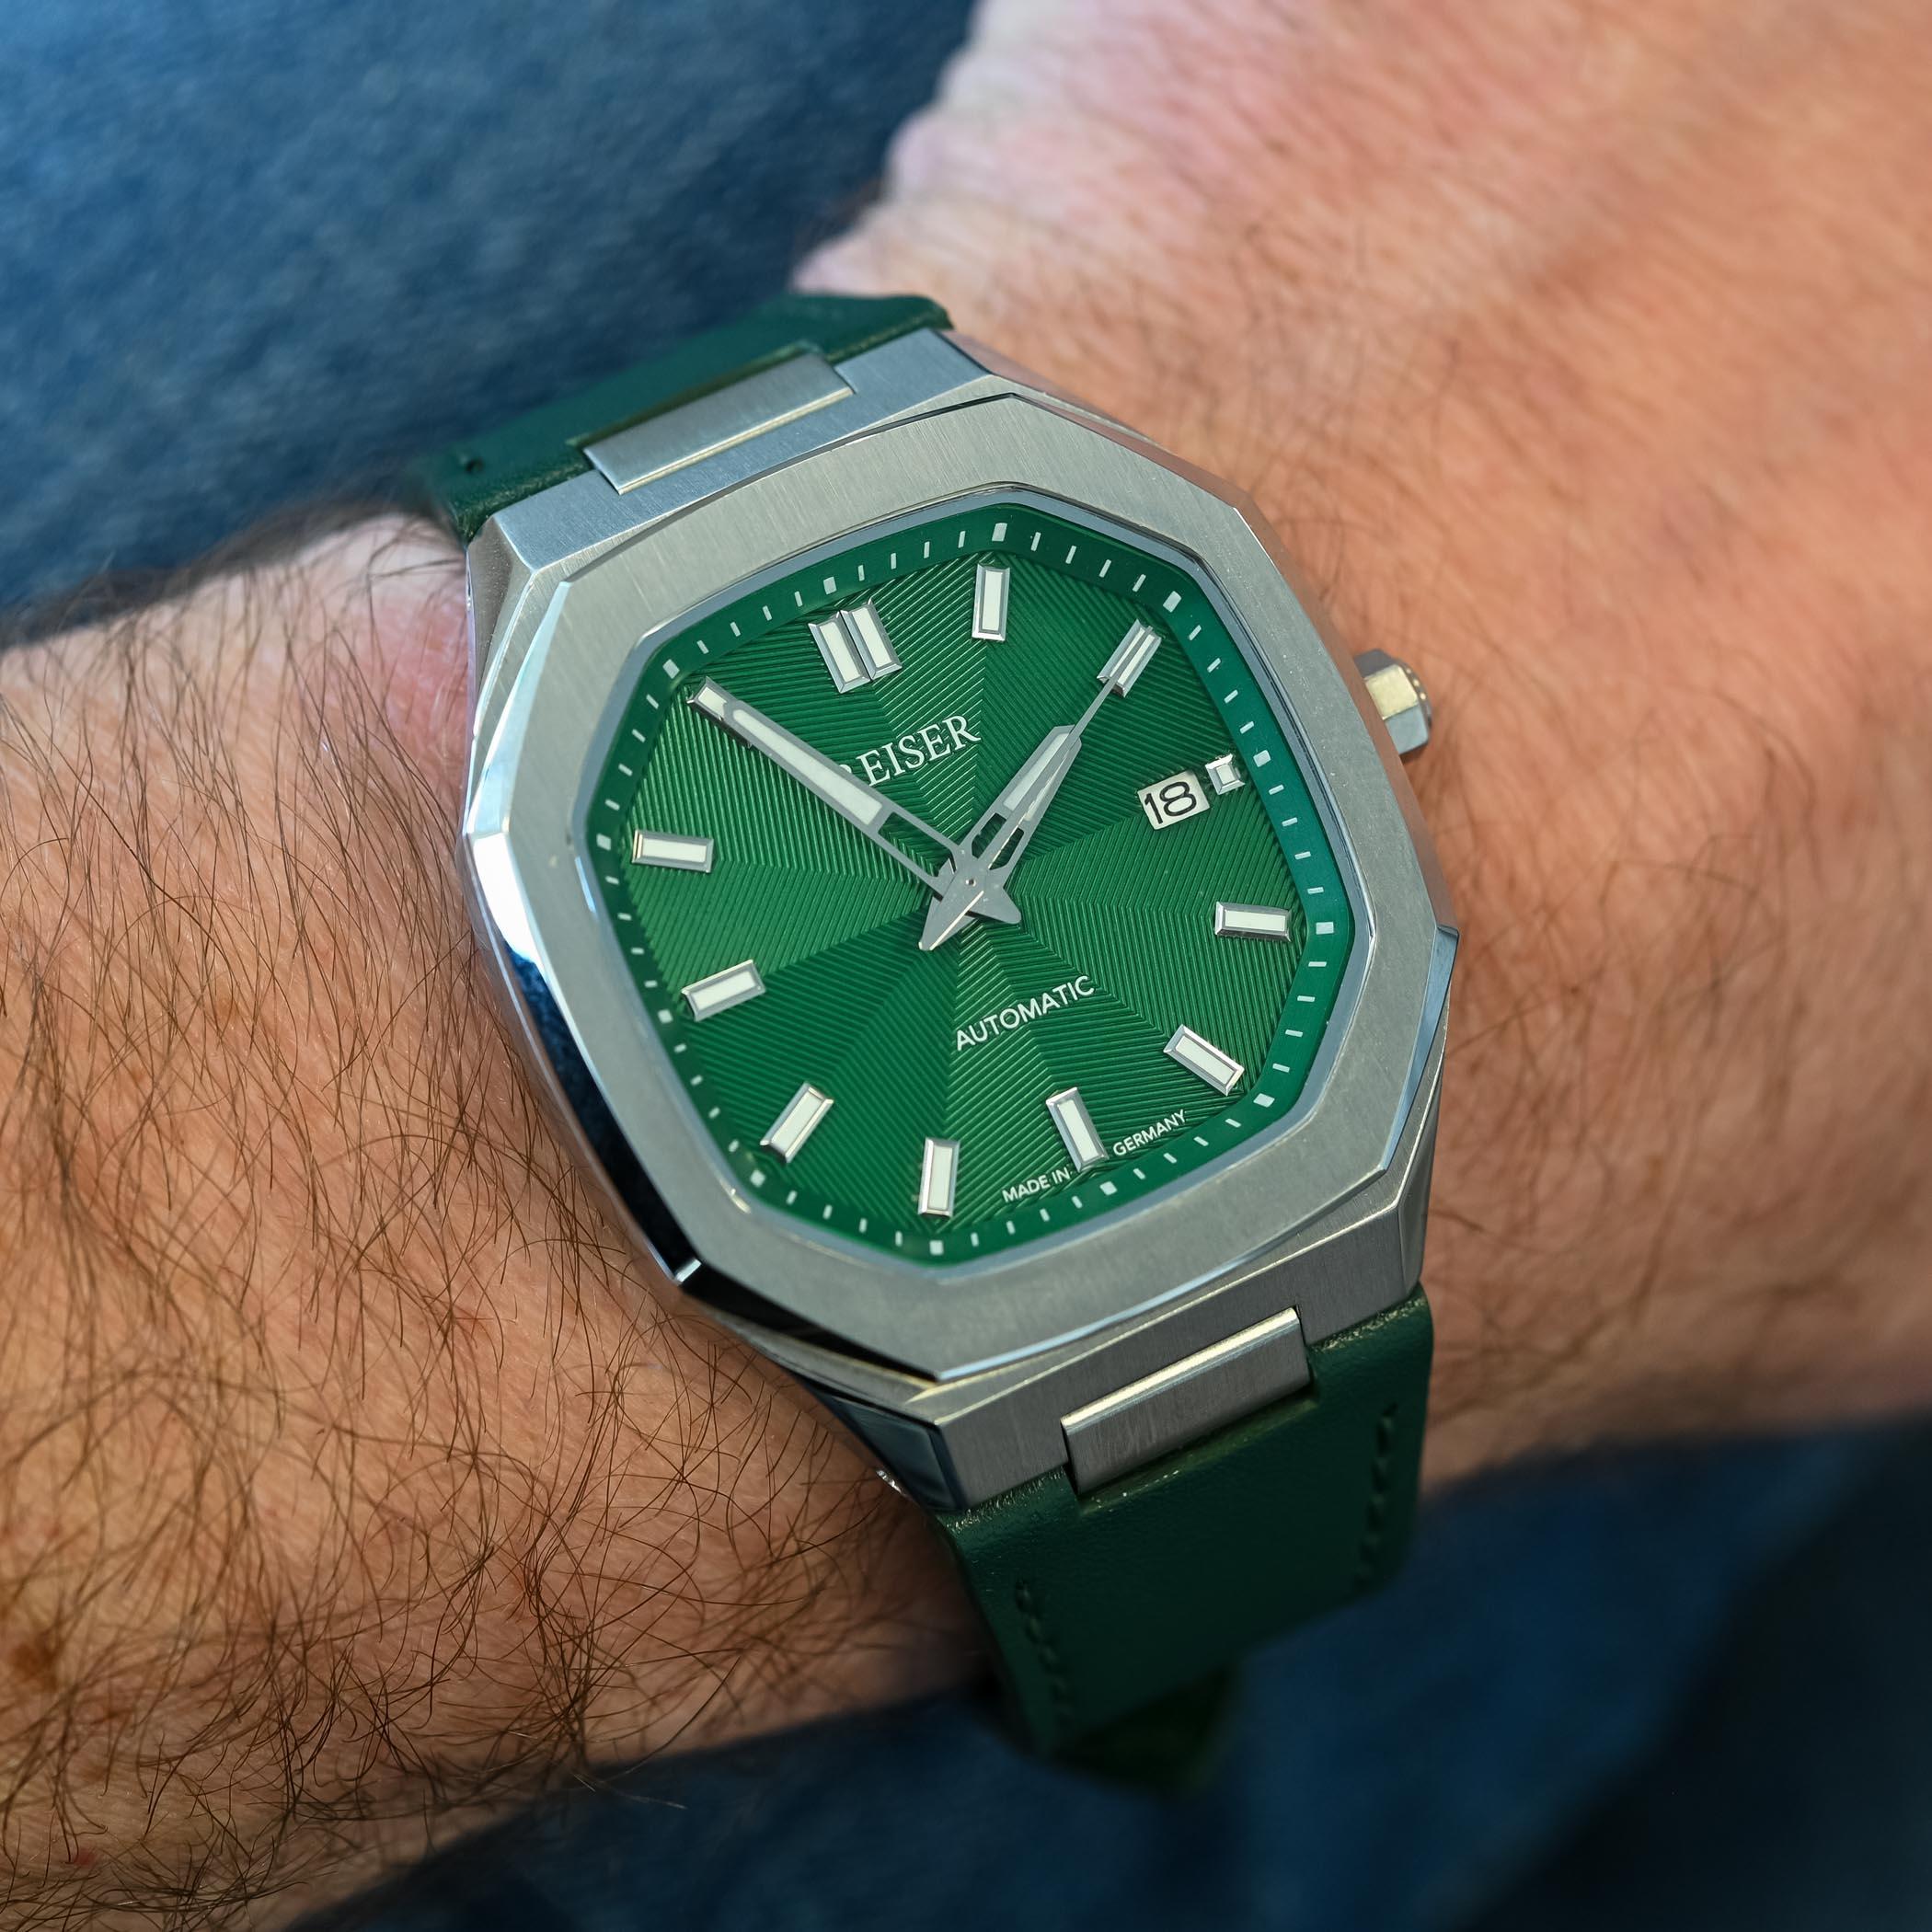 Reiser Alpen Date Watch - value proposition hands-on - 2